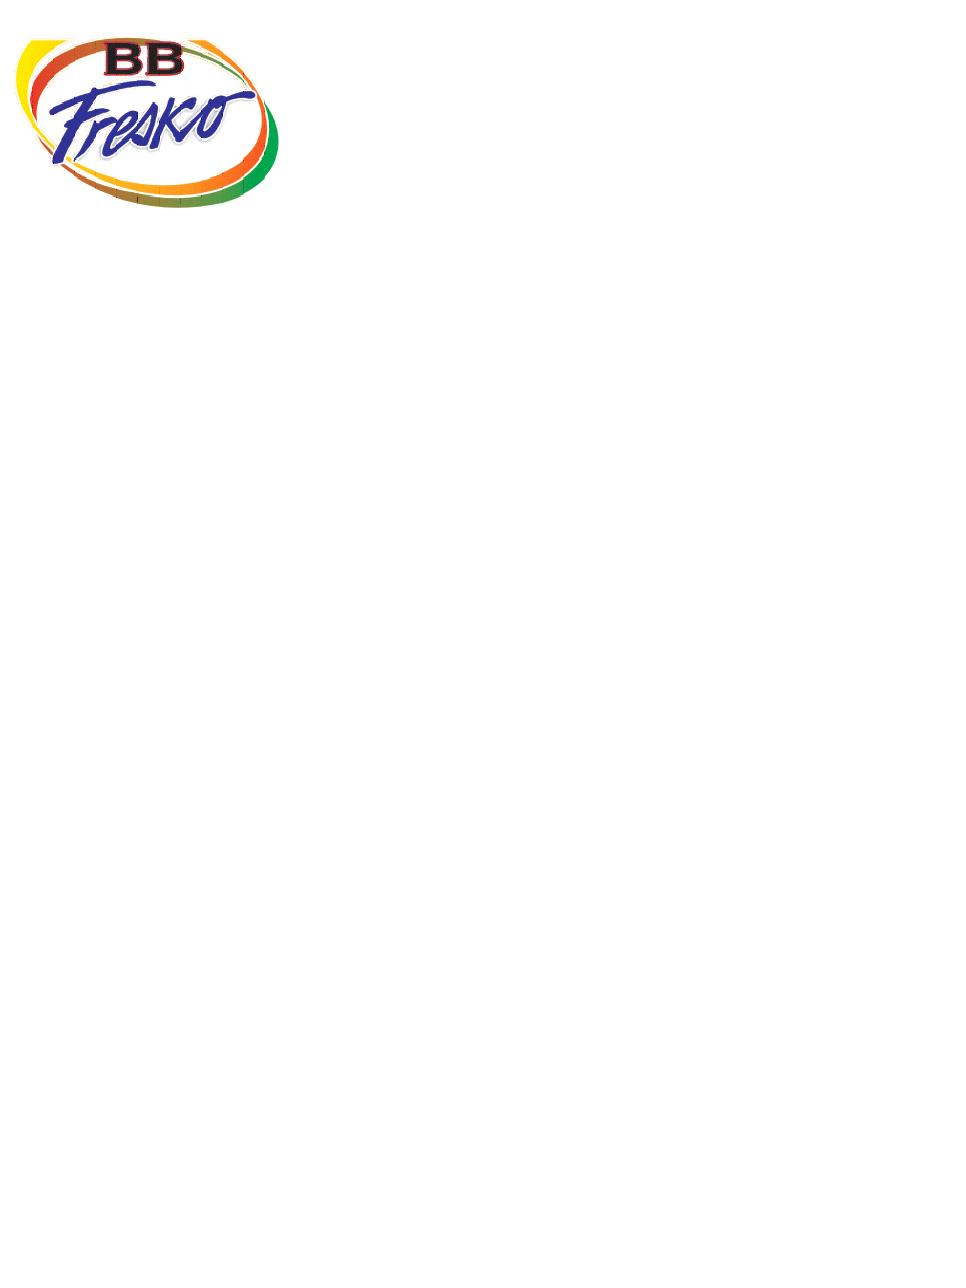 BB Fresko logo